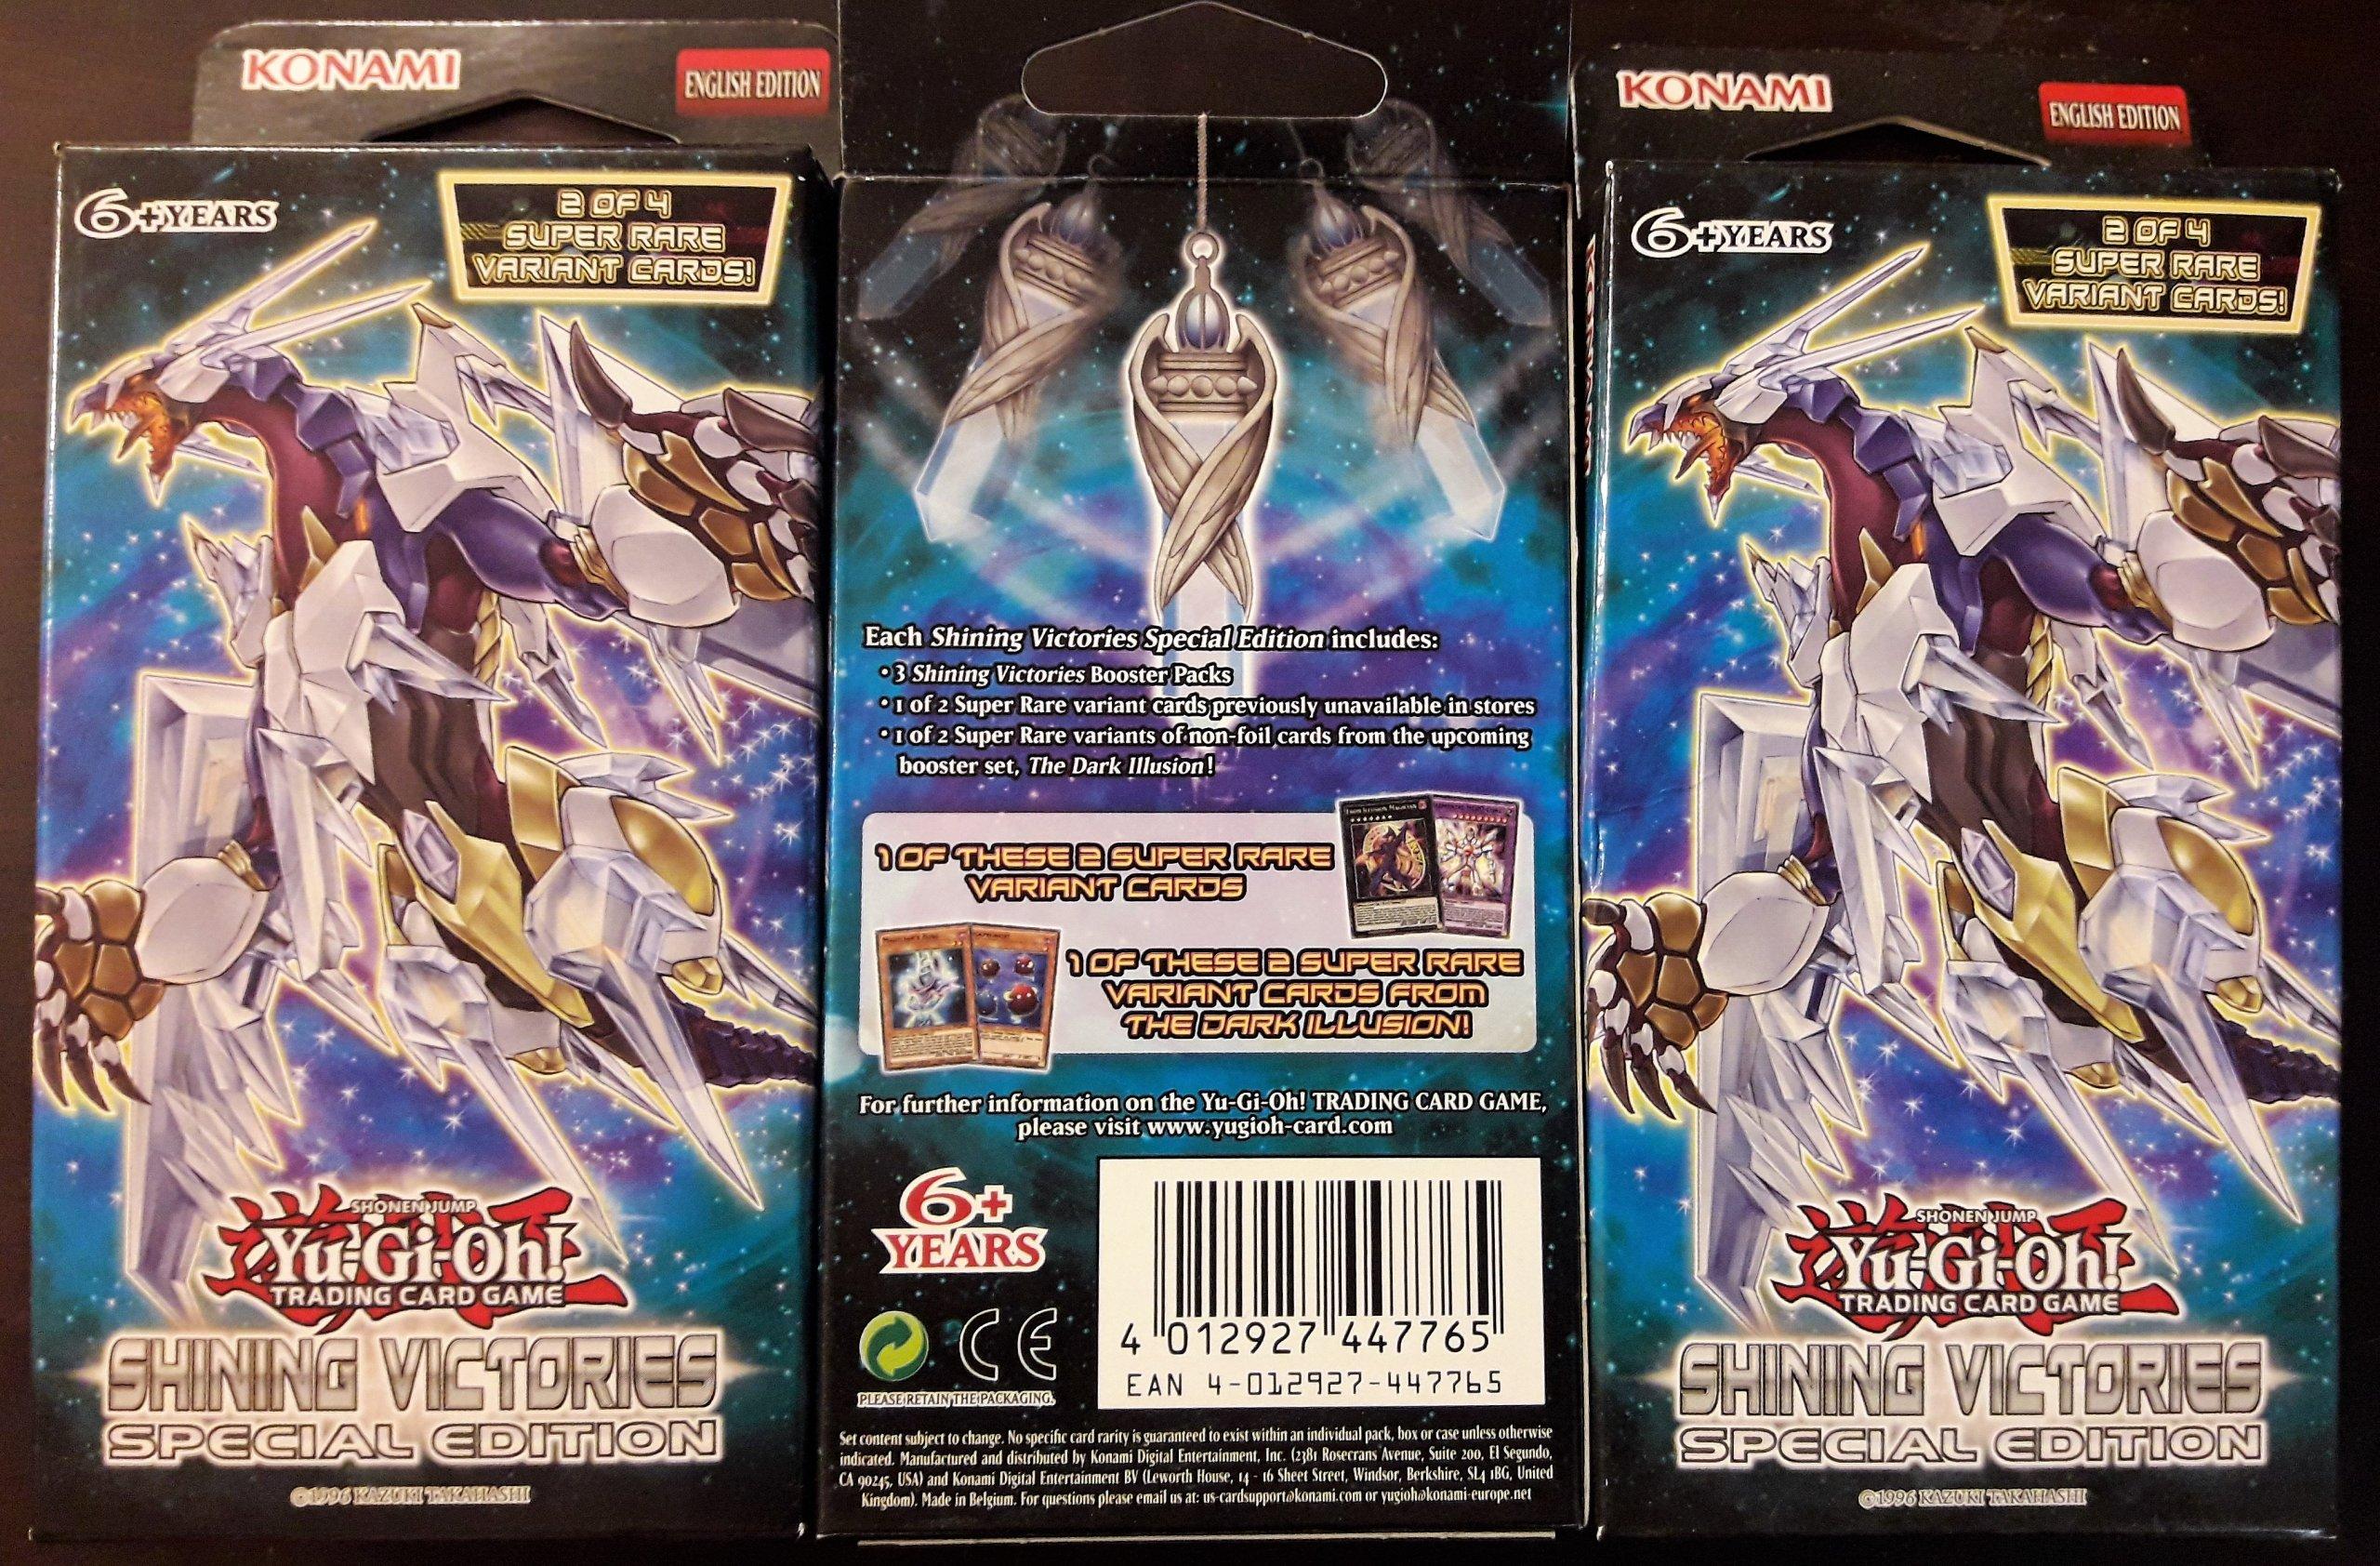 [GNOM] Yu-Gi-Oh Shining Victories Special Edition